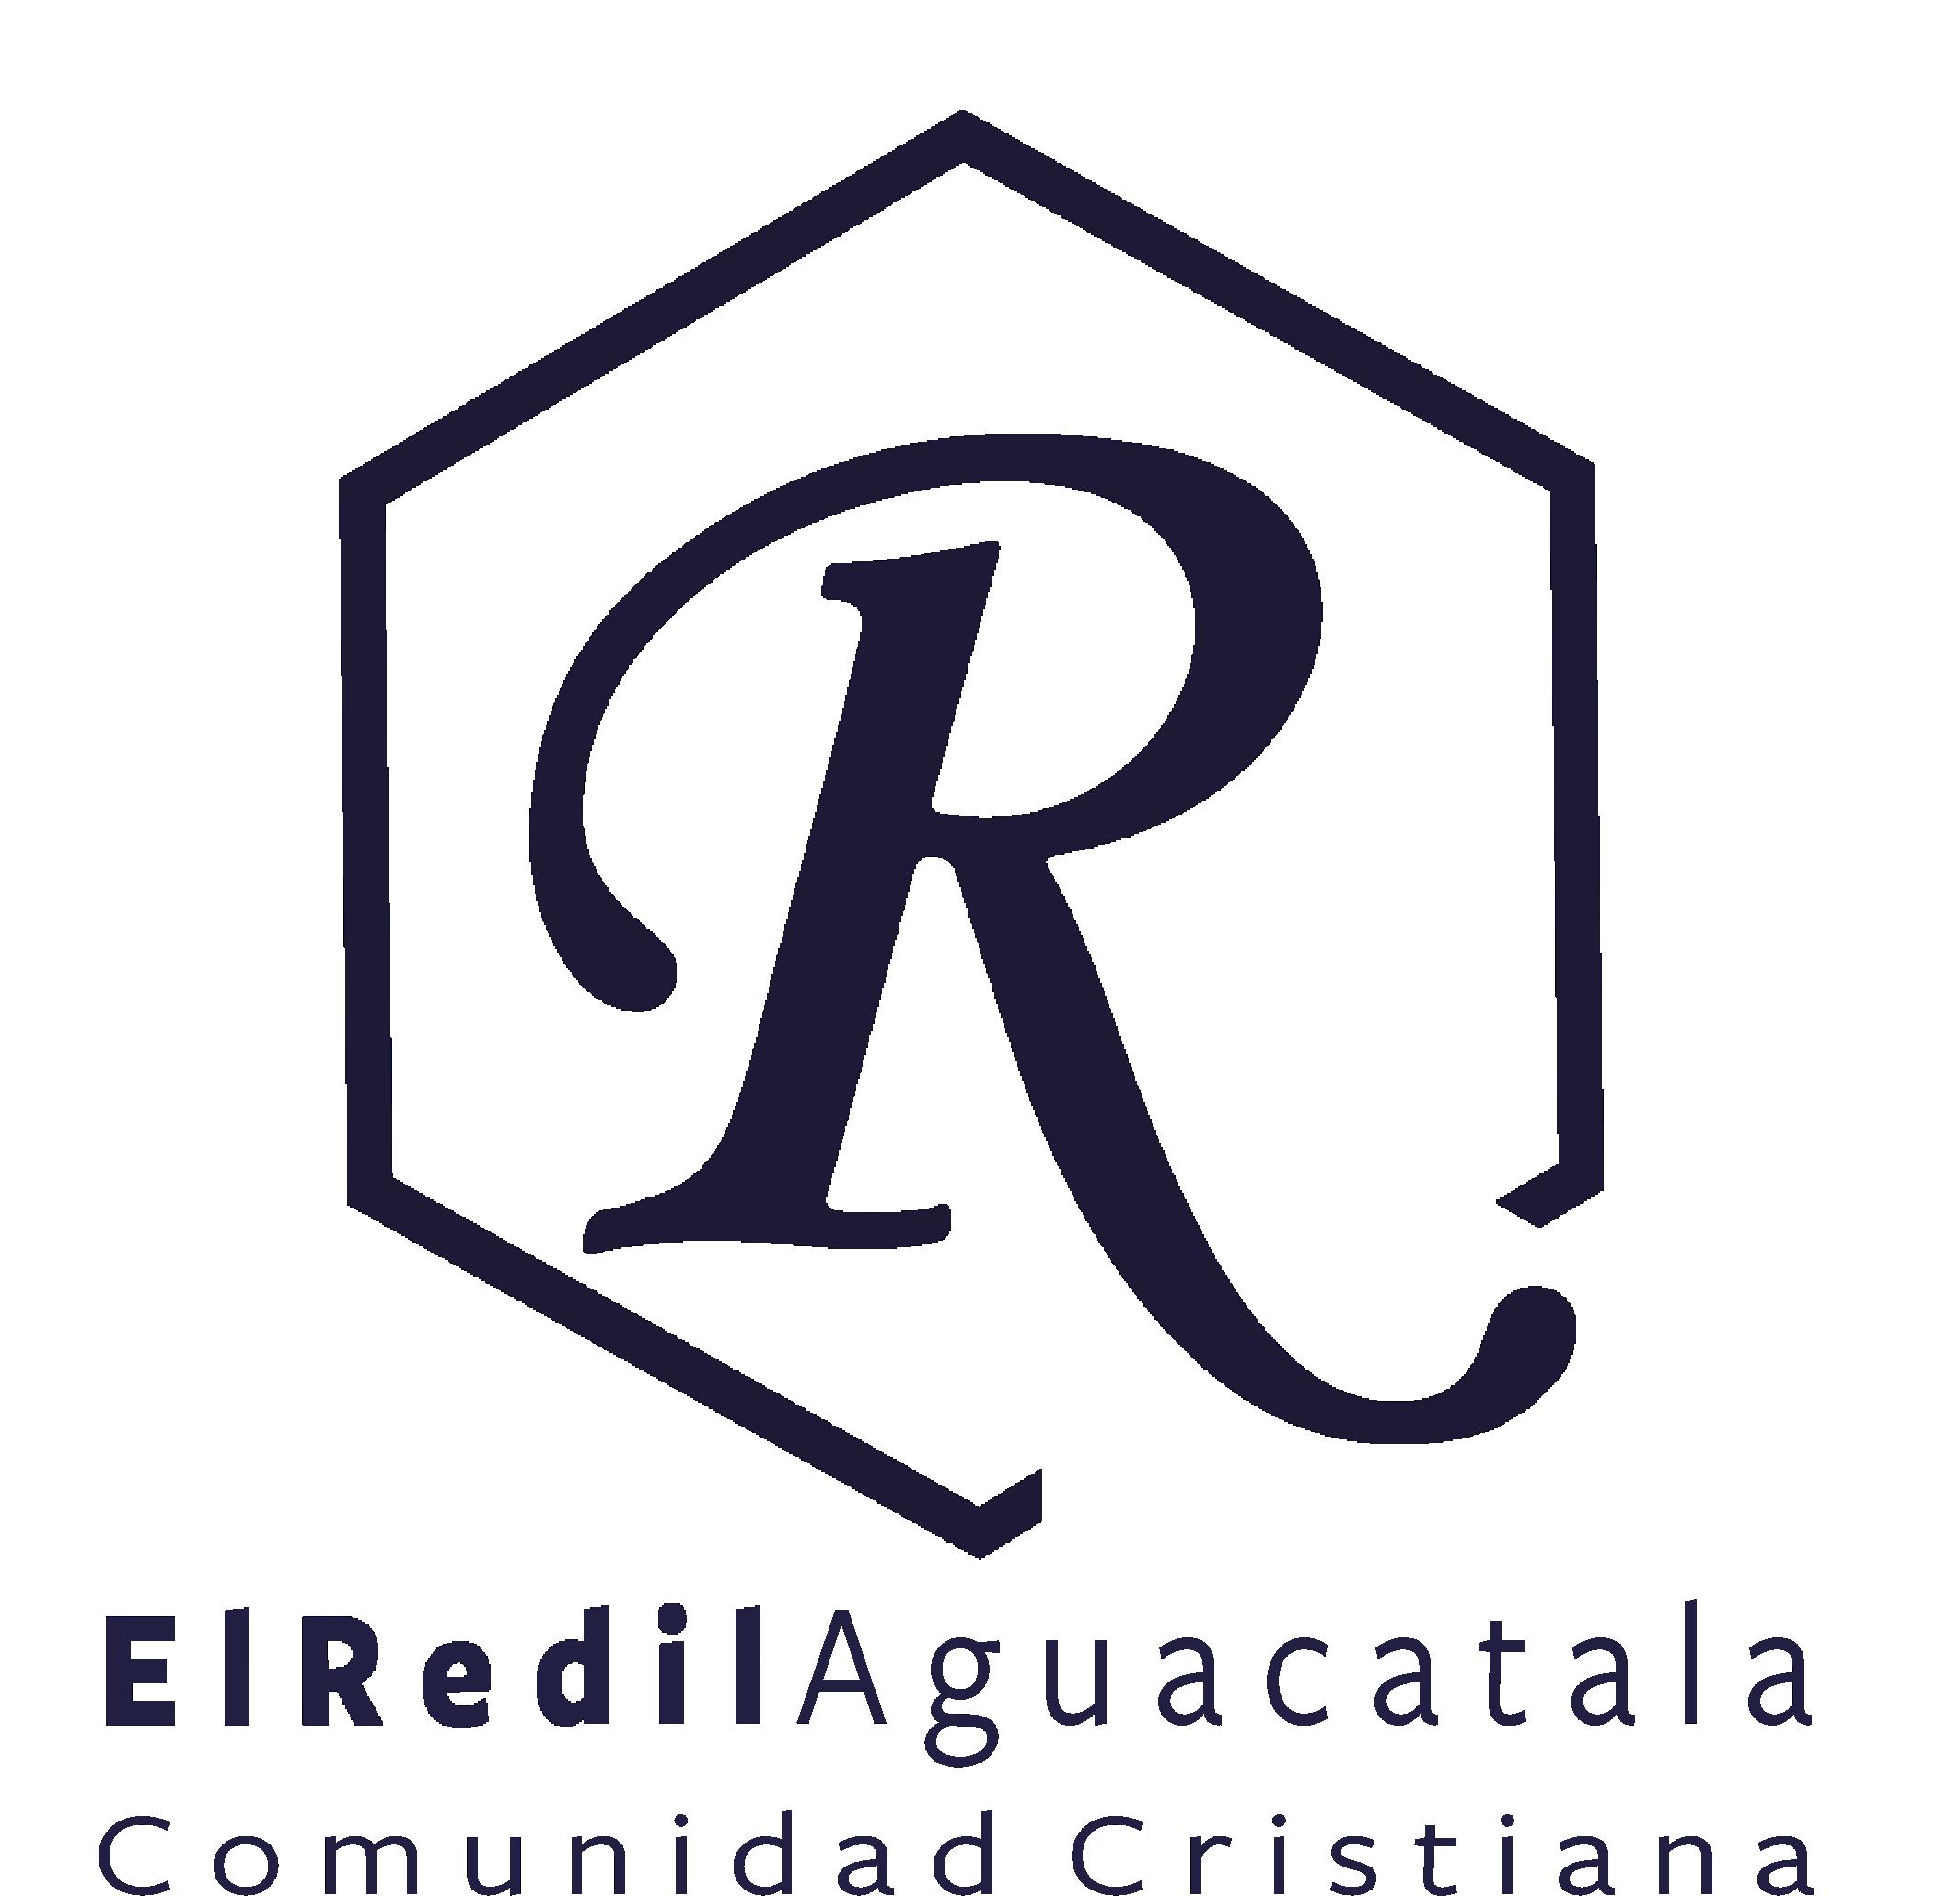 1582137219843_logo REDIL AGUACATALA